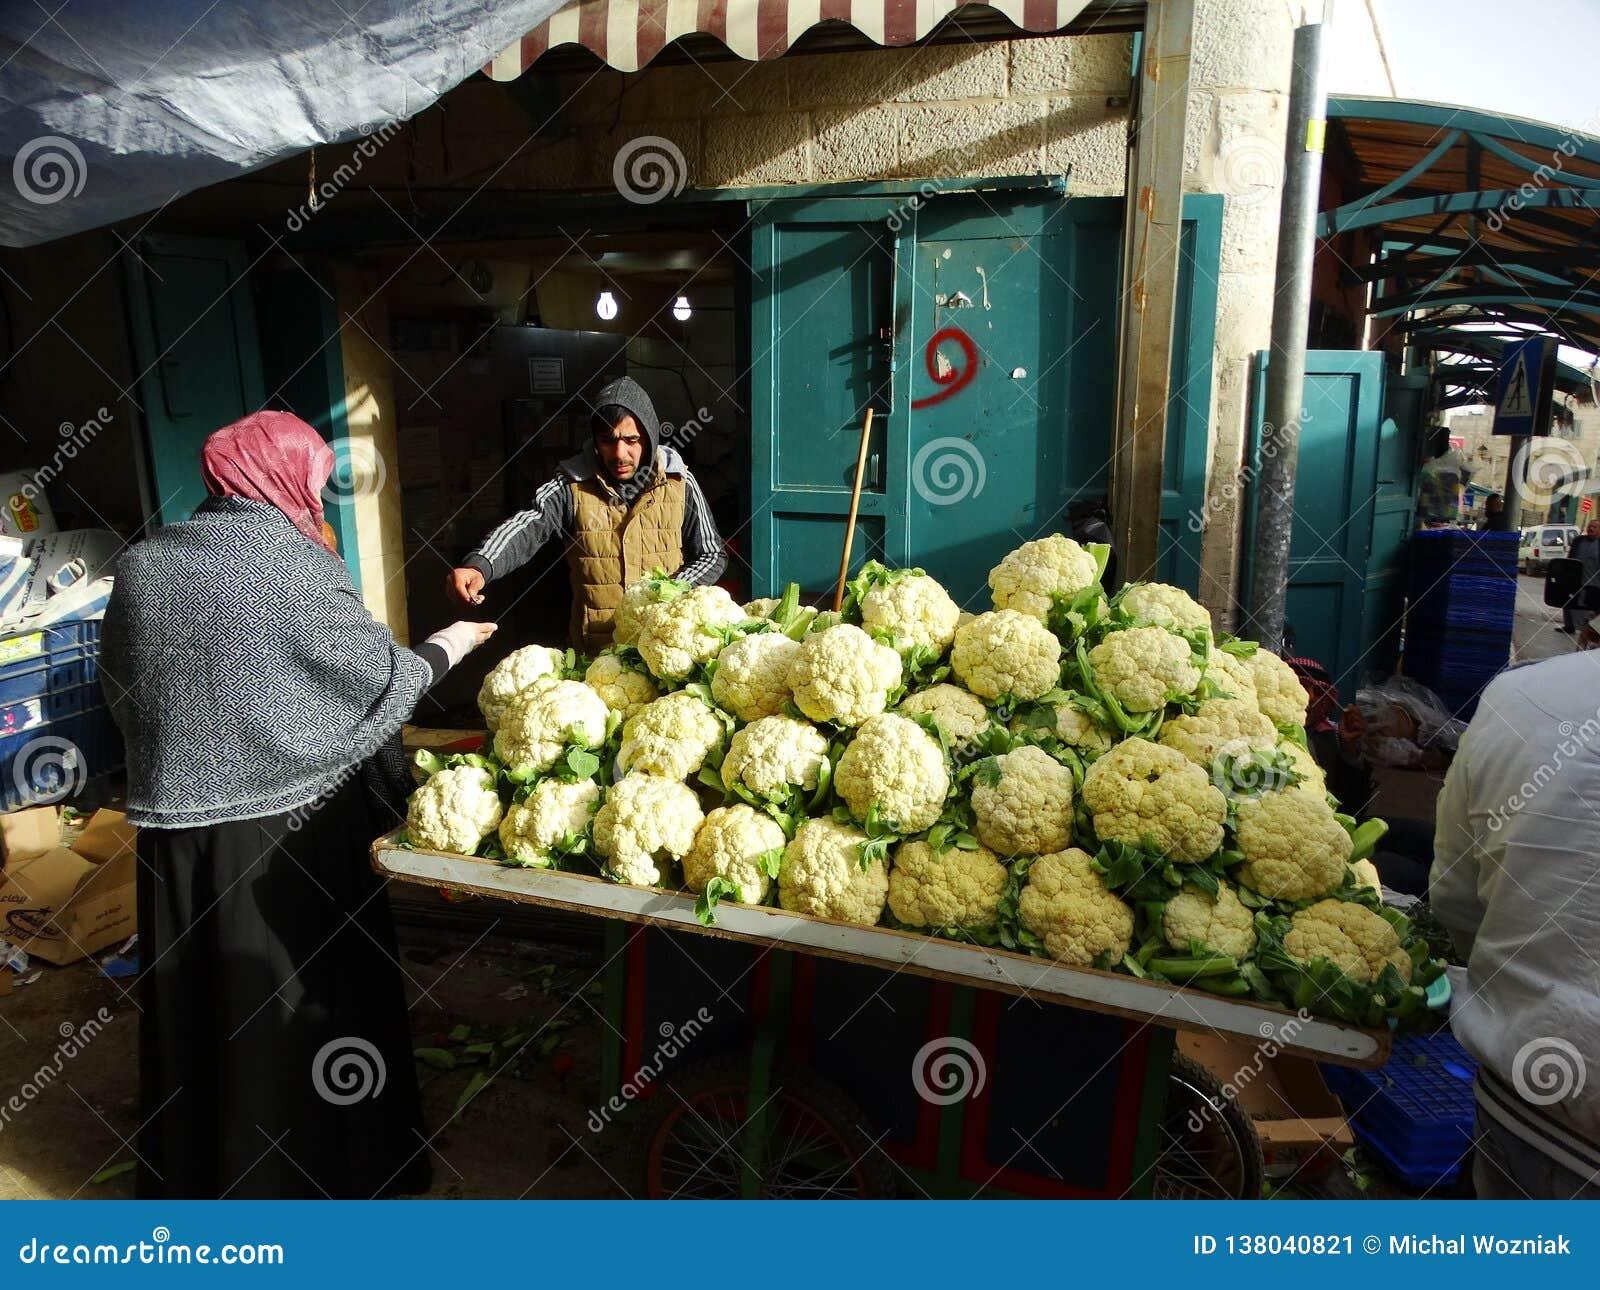 Street scene of Bethlehem, Palestine Israel